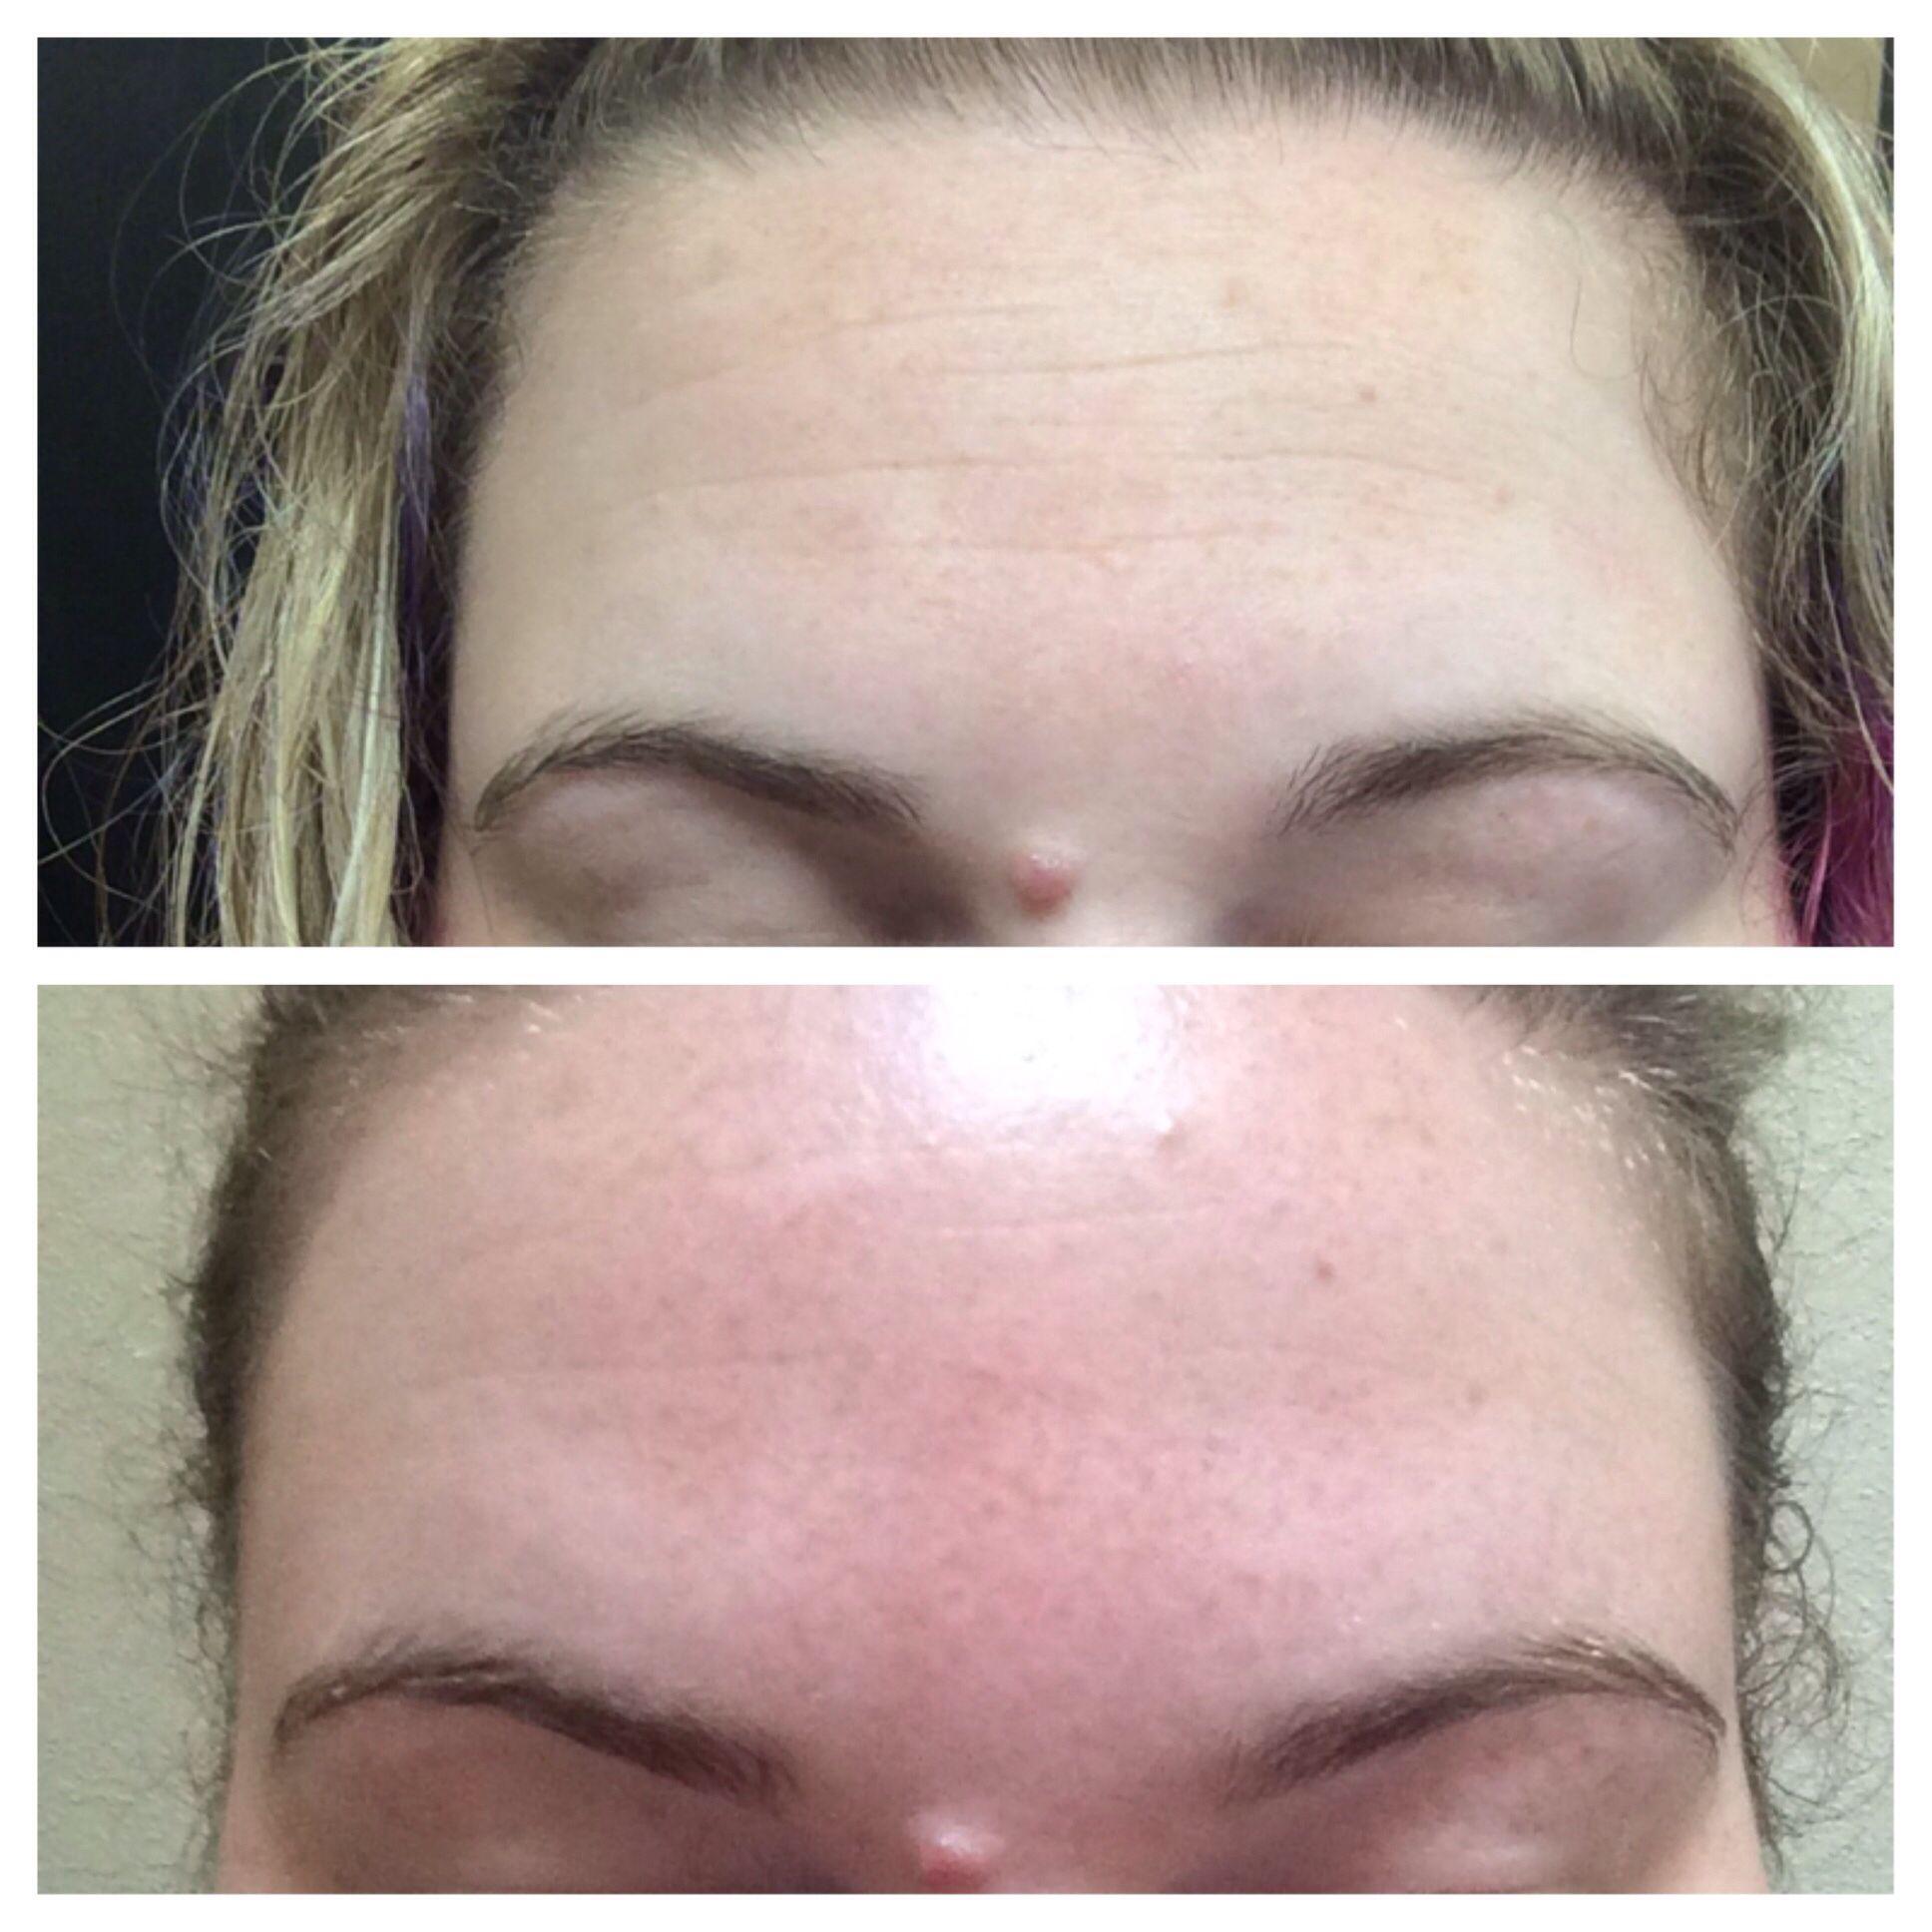 c4aba287b7c Forehead Wrinkles! NeriumAD! Carisafernandez.nerium.com 30 day money ...